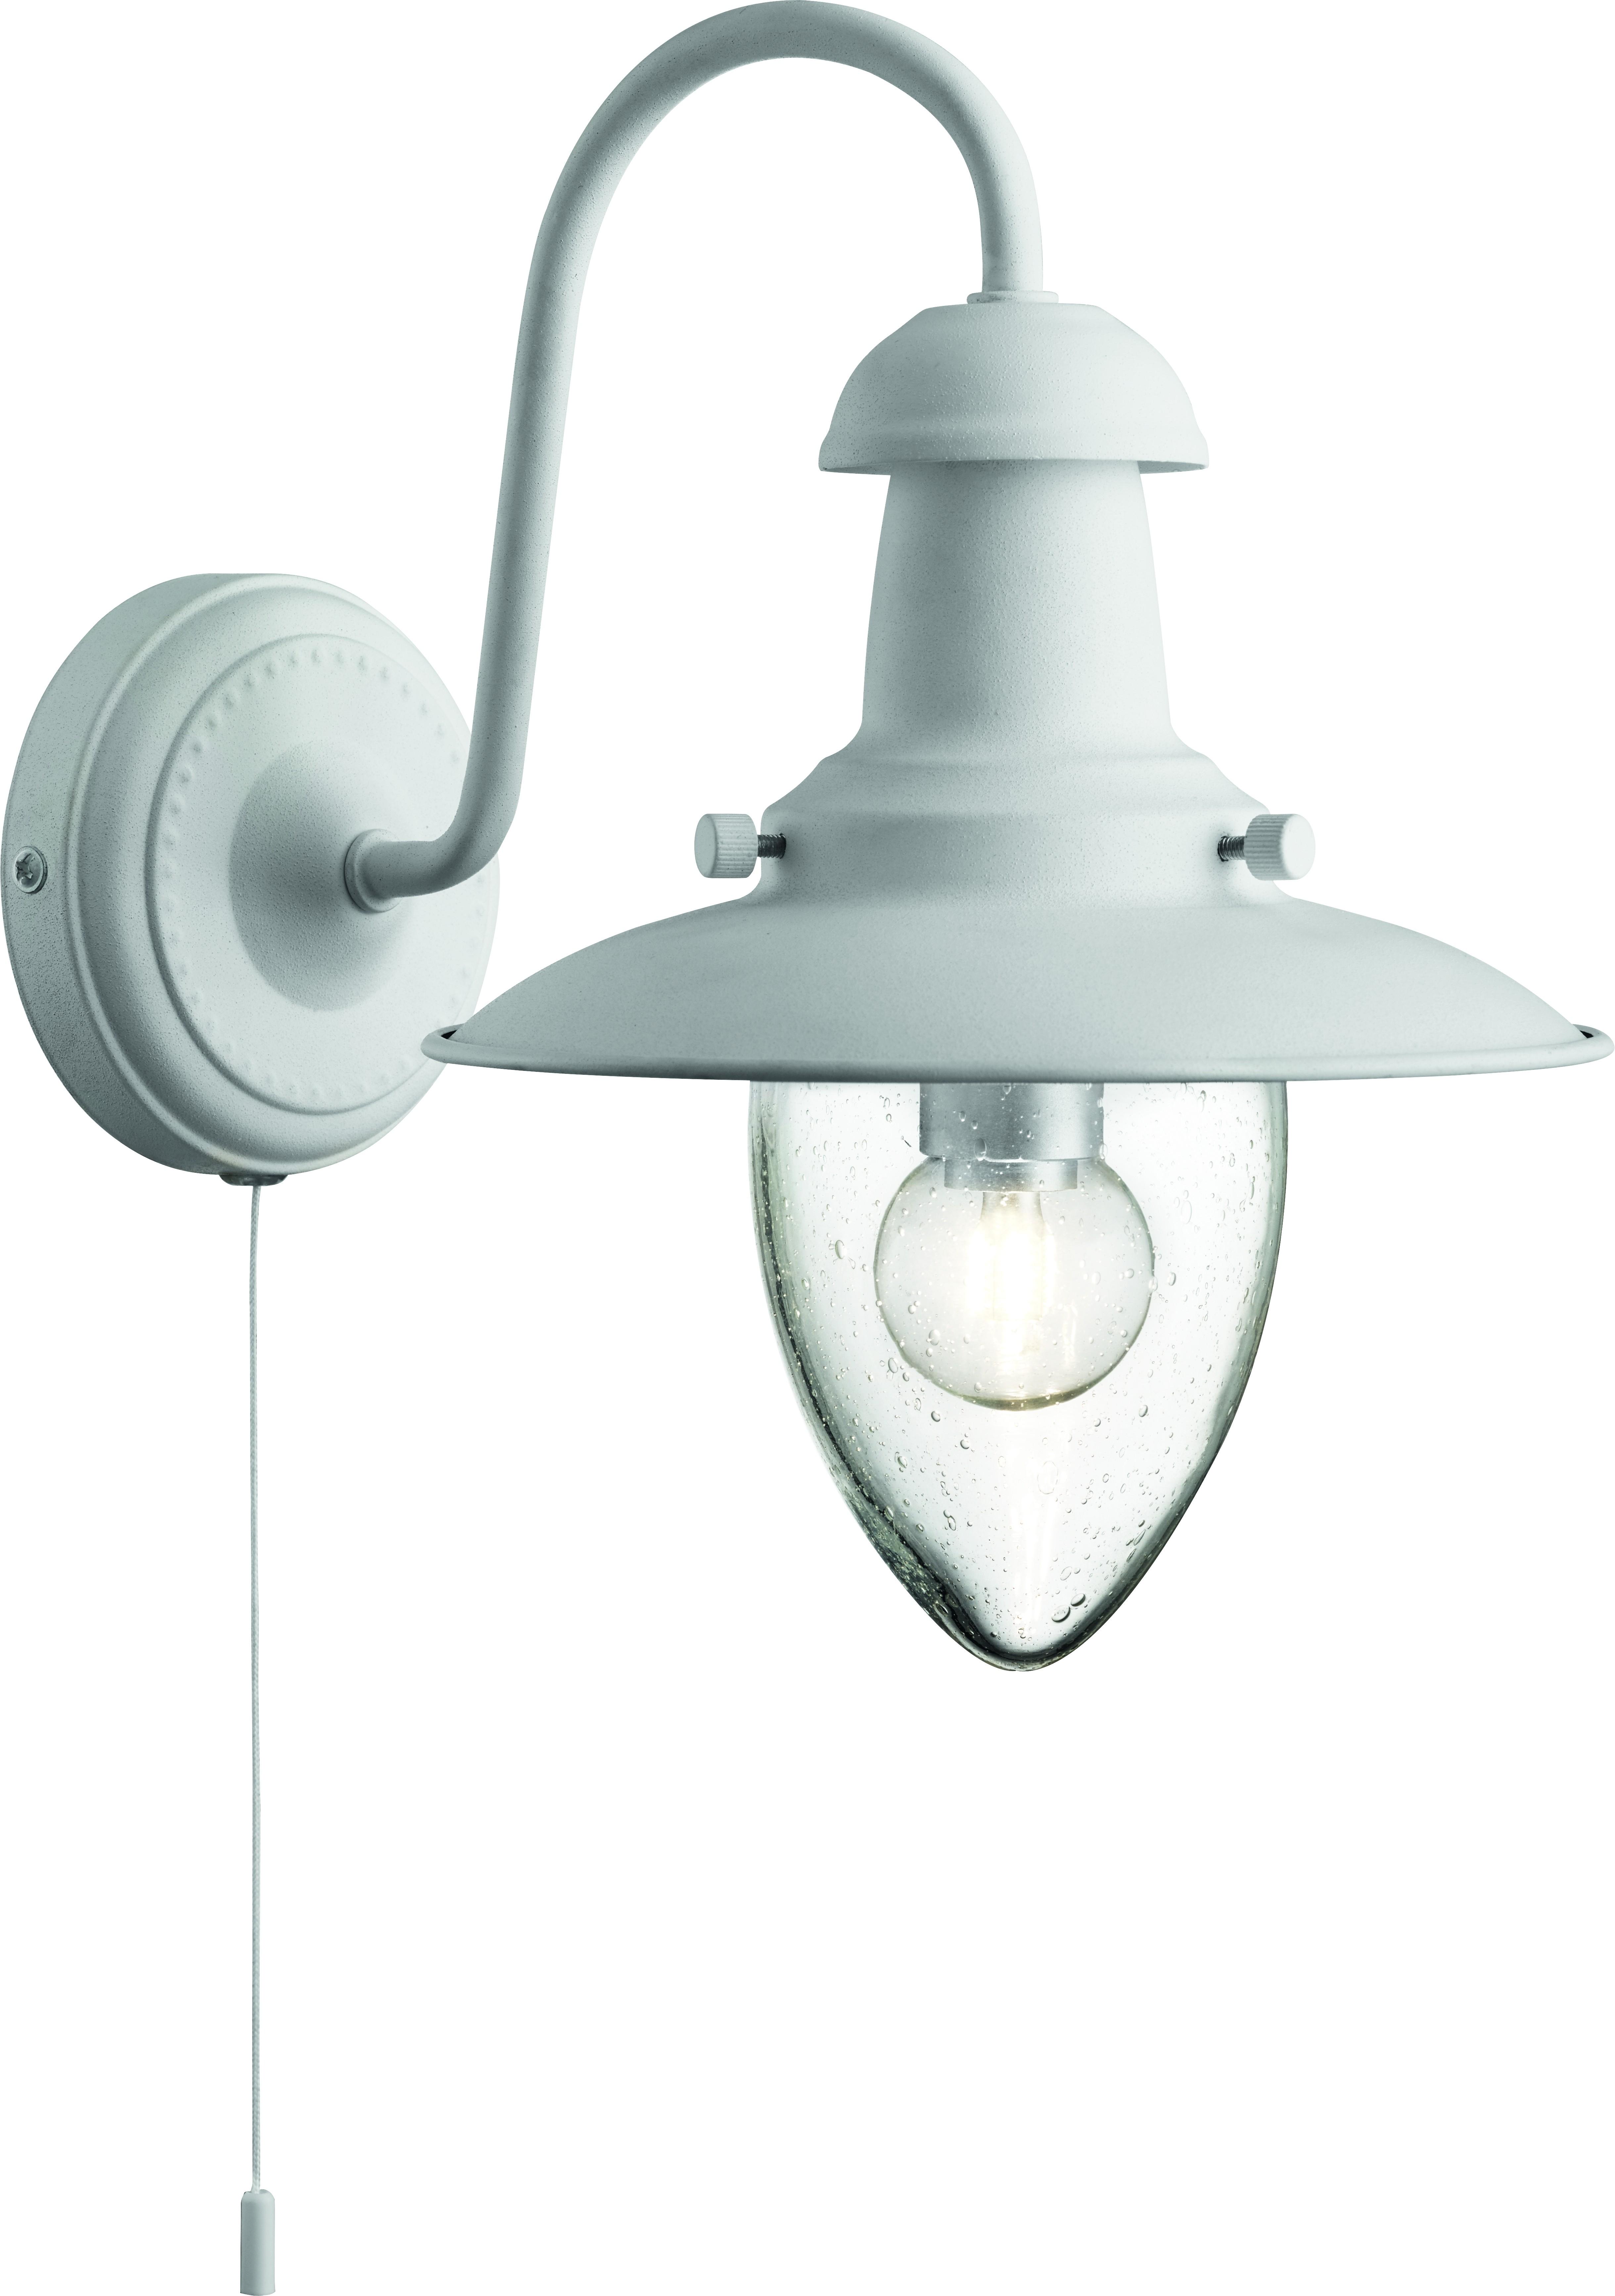 Купить Бра Arte lamp A5518ap-1wh